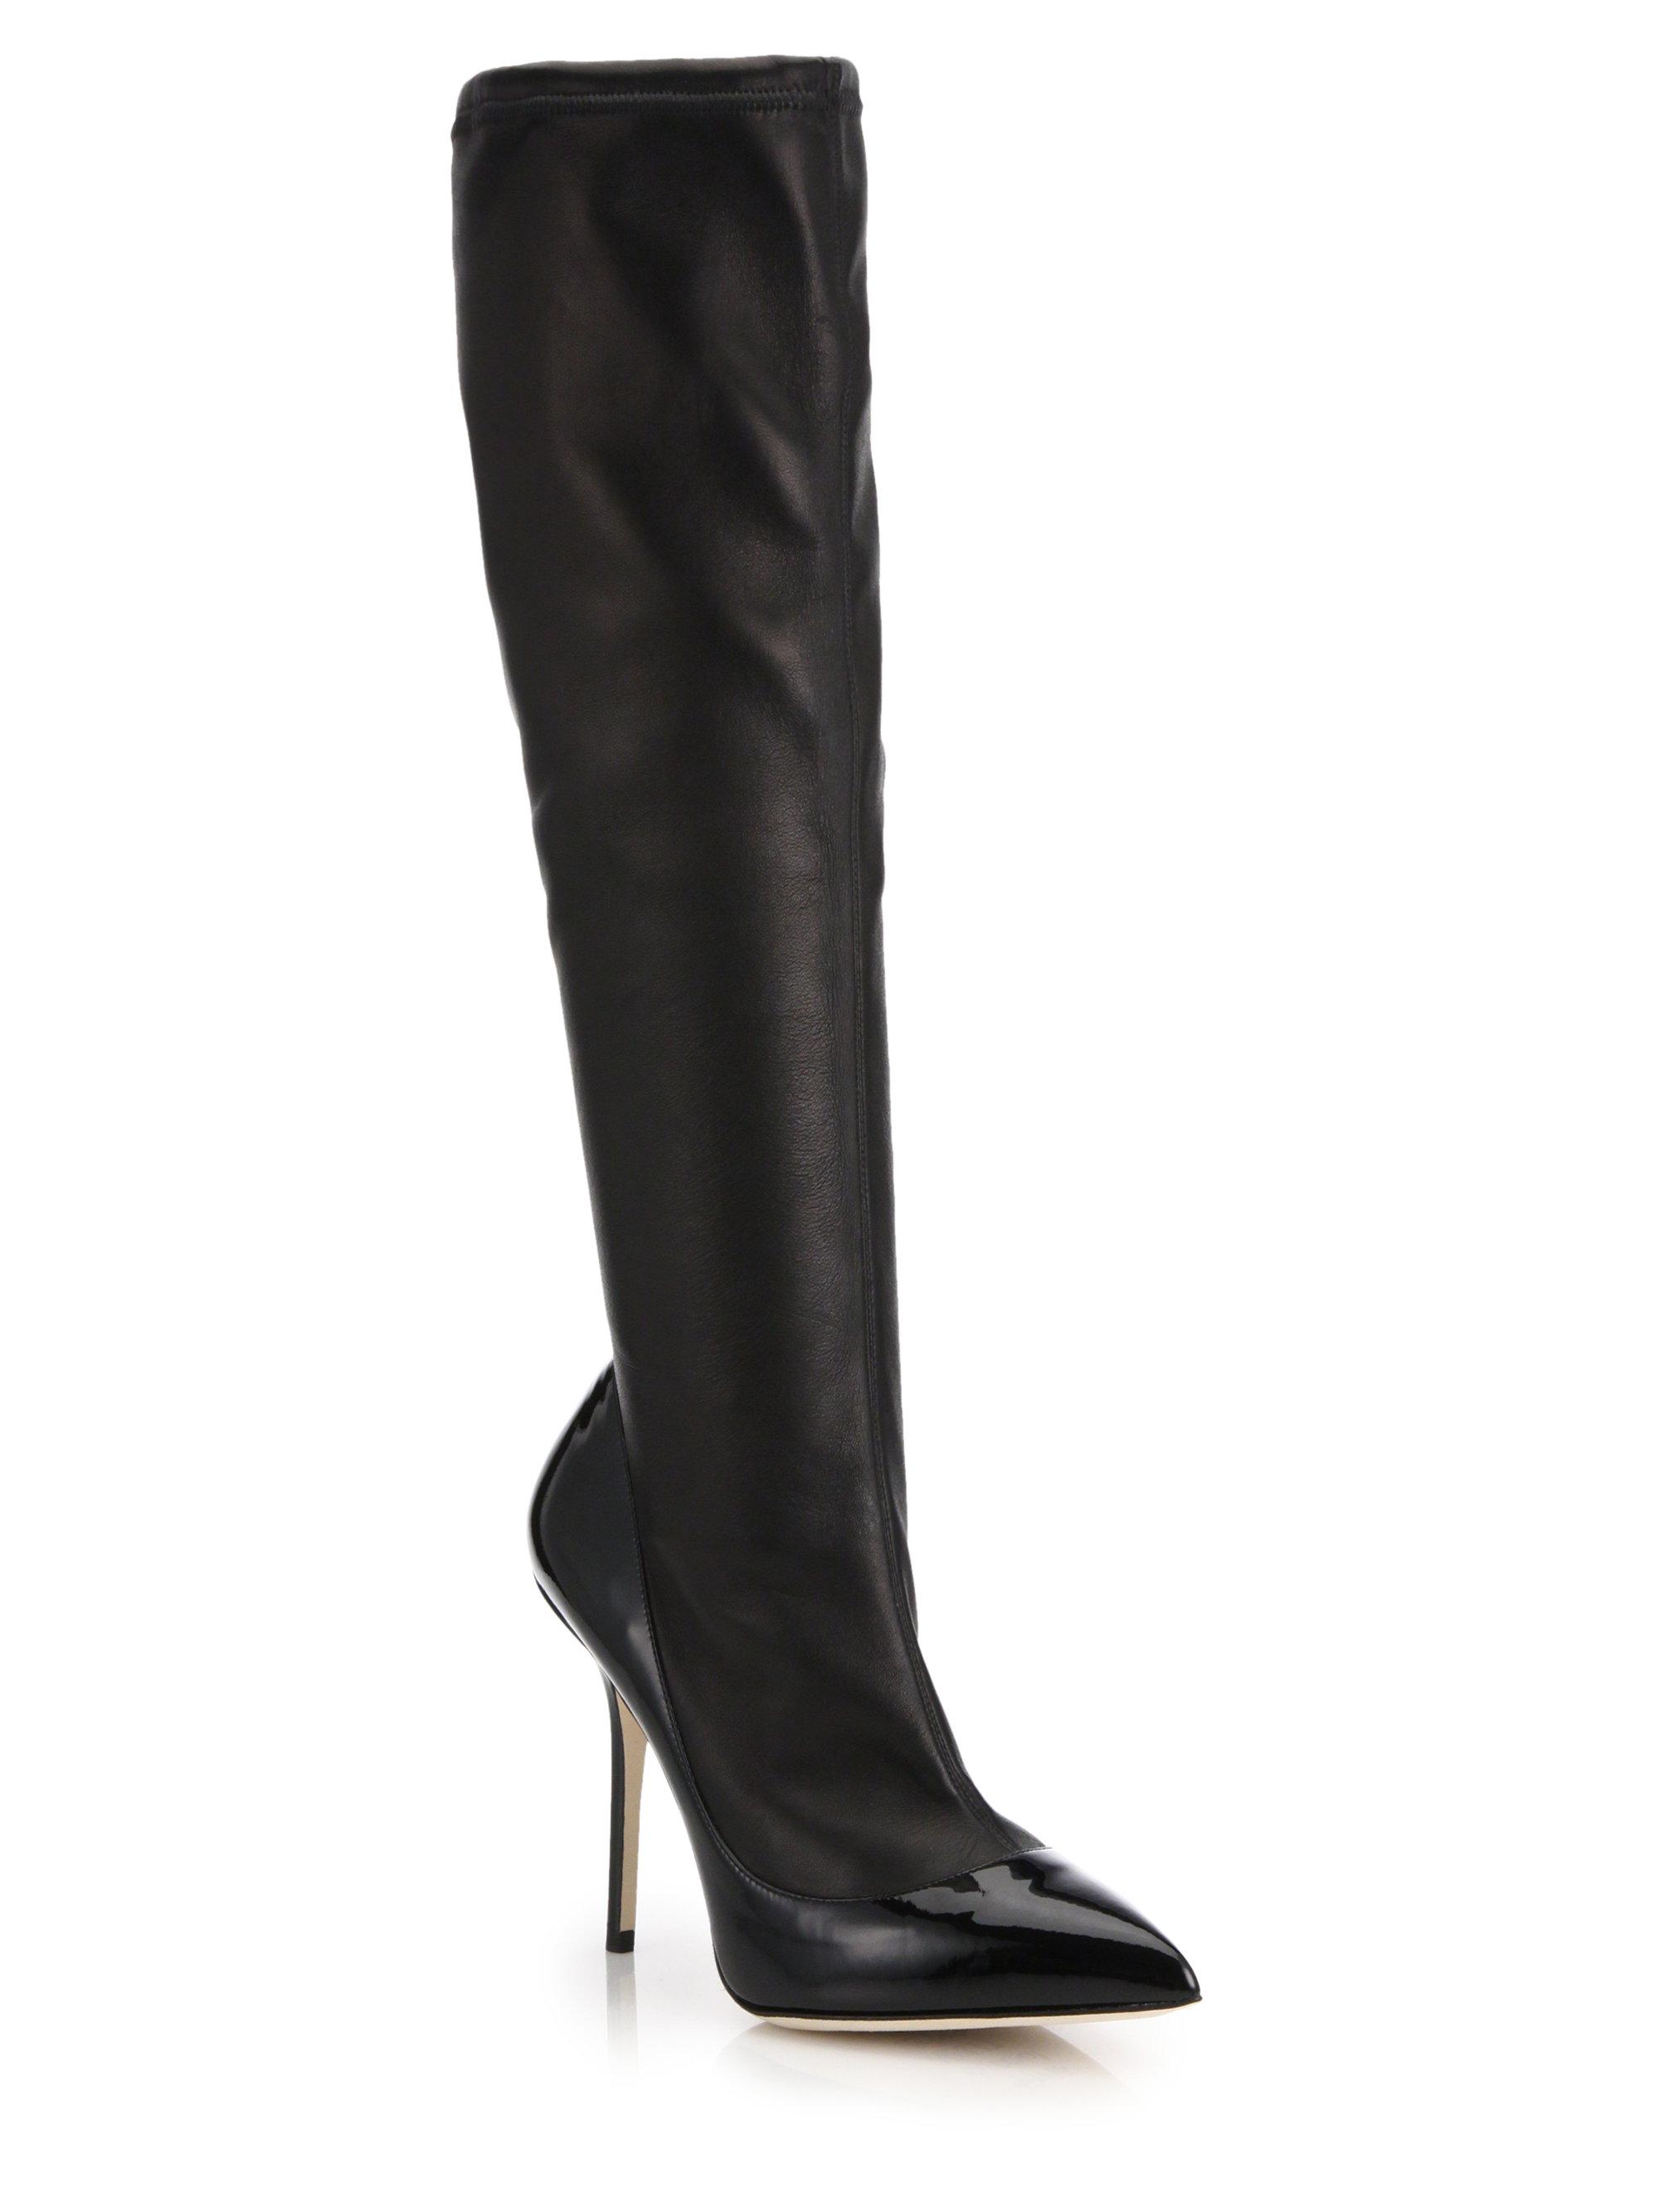 dolce gabbana stretch nappa patent leather knee high